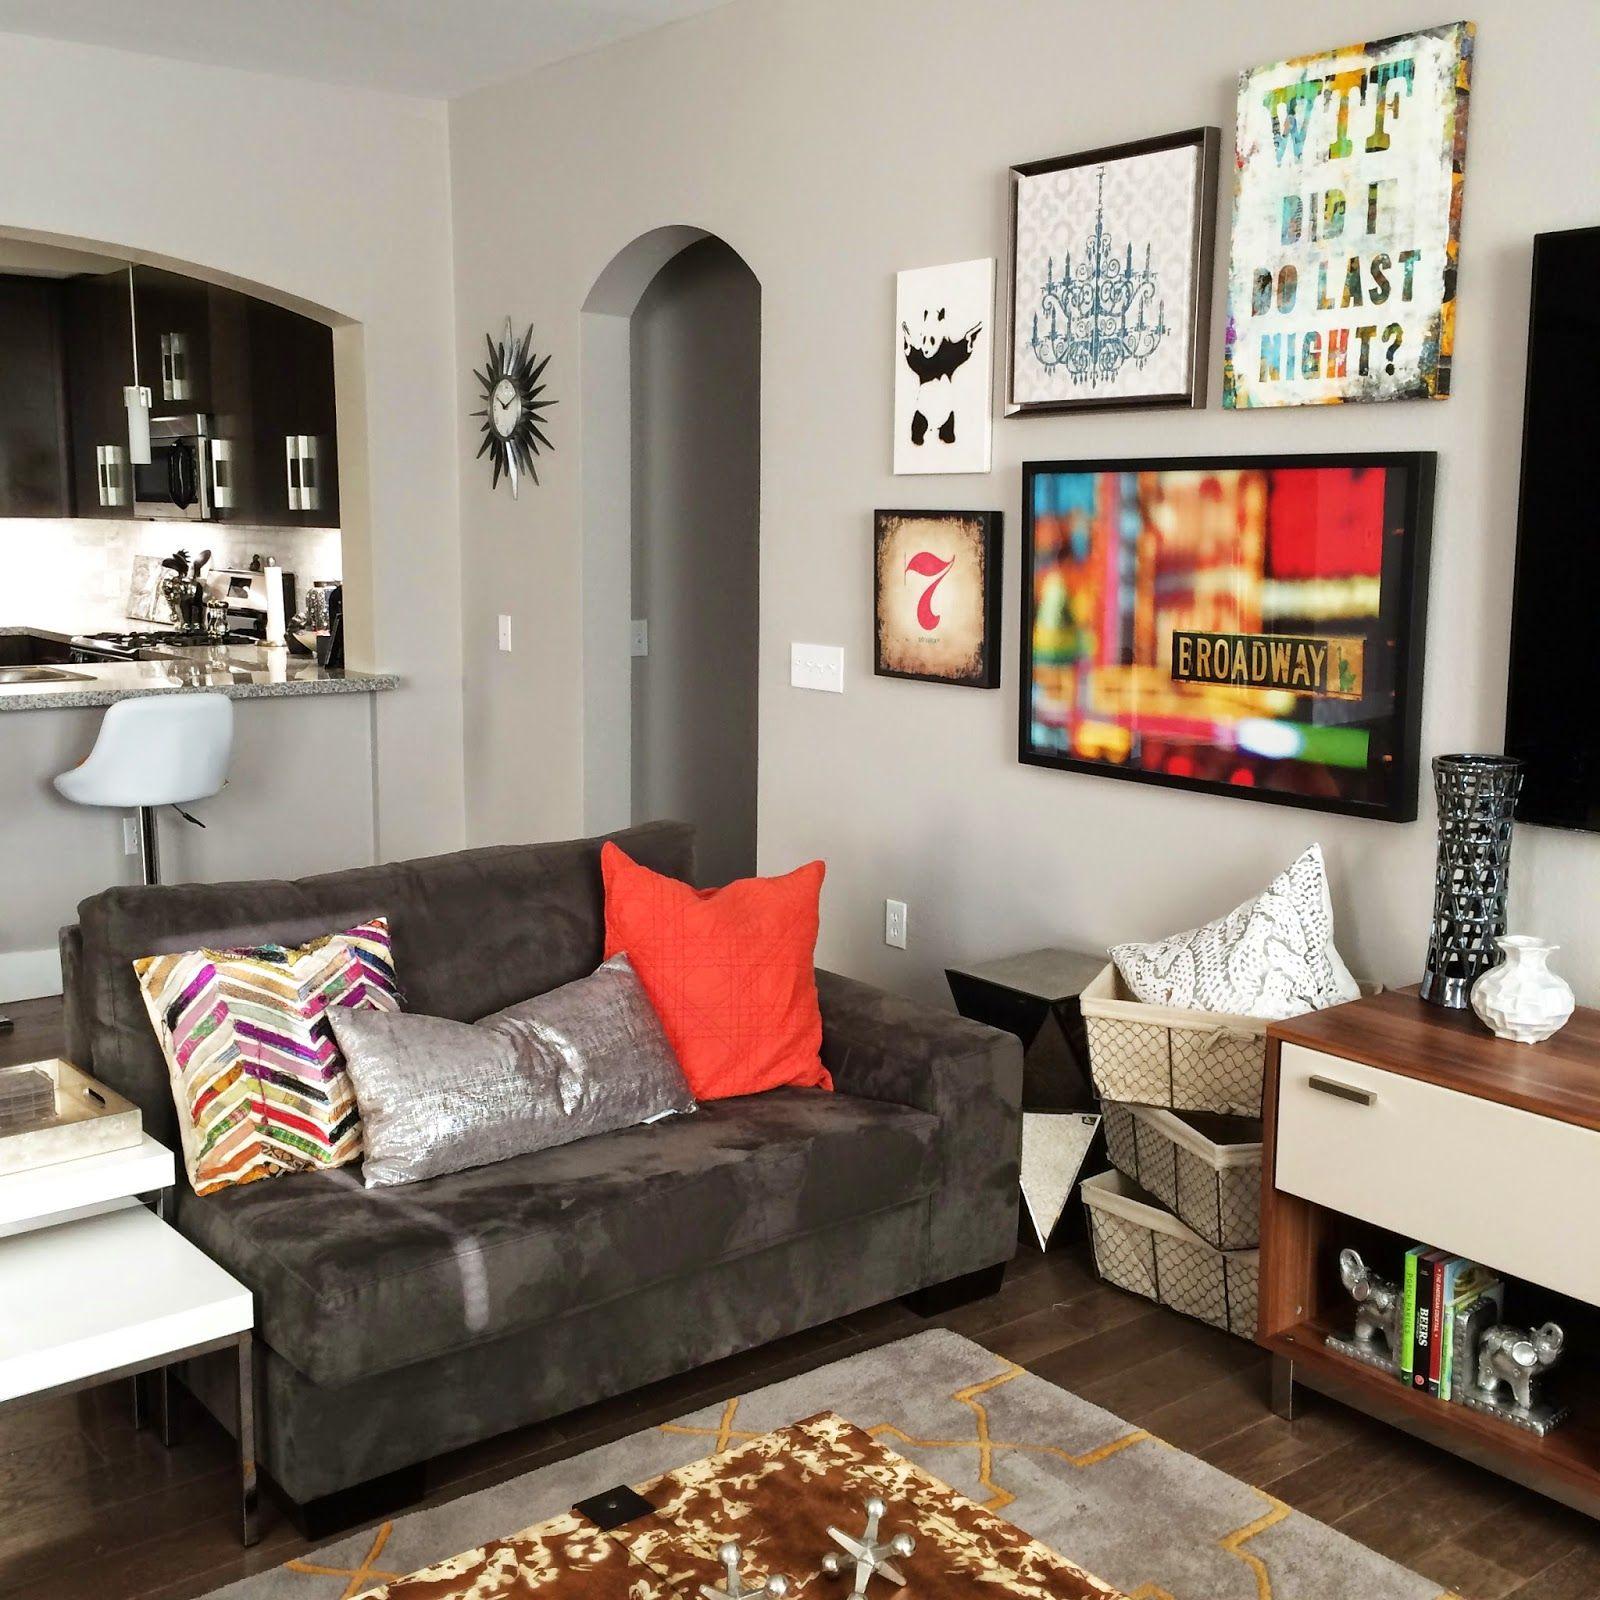 Diy Interior Decorating: ... Bachelor-pad-decorating